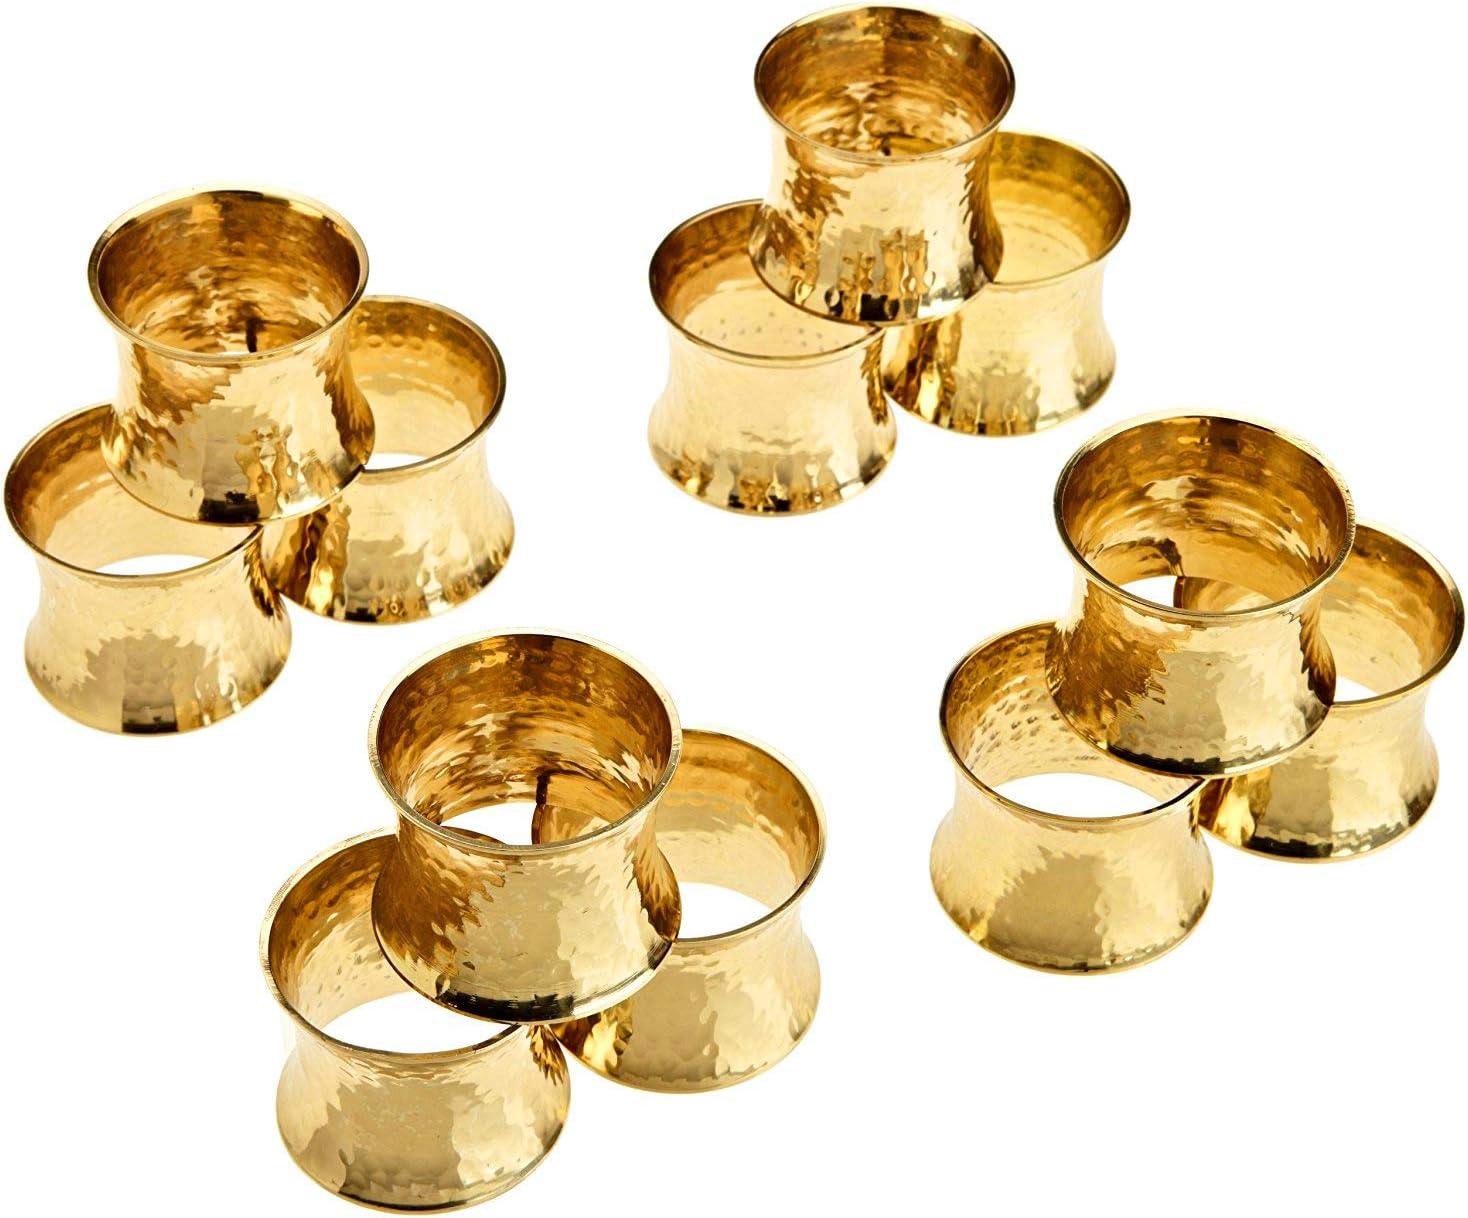 SKAVIJ Gold Metall Solide Geh/ämmert Serviettenring-Set f/ür Esstischdekoration 6 st/ück